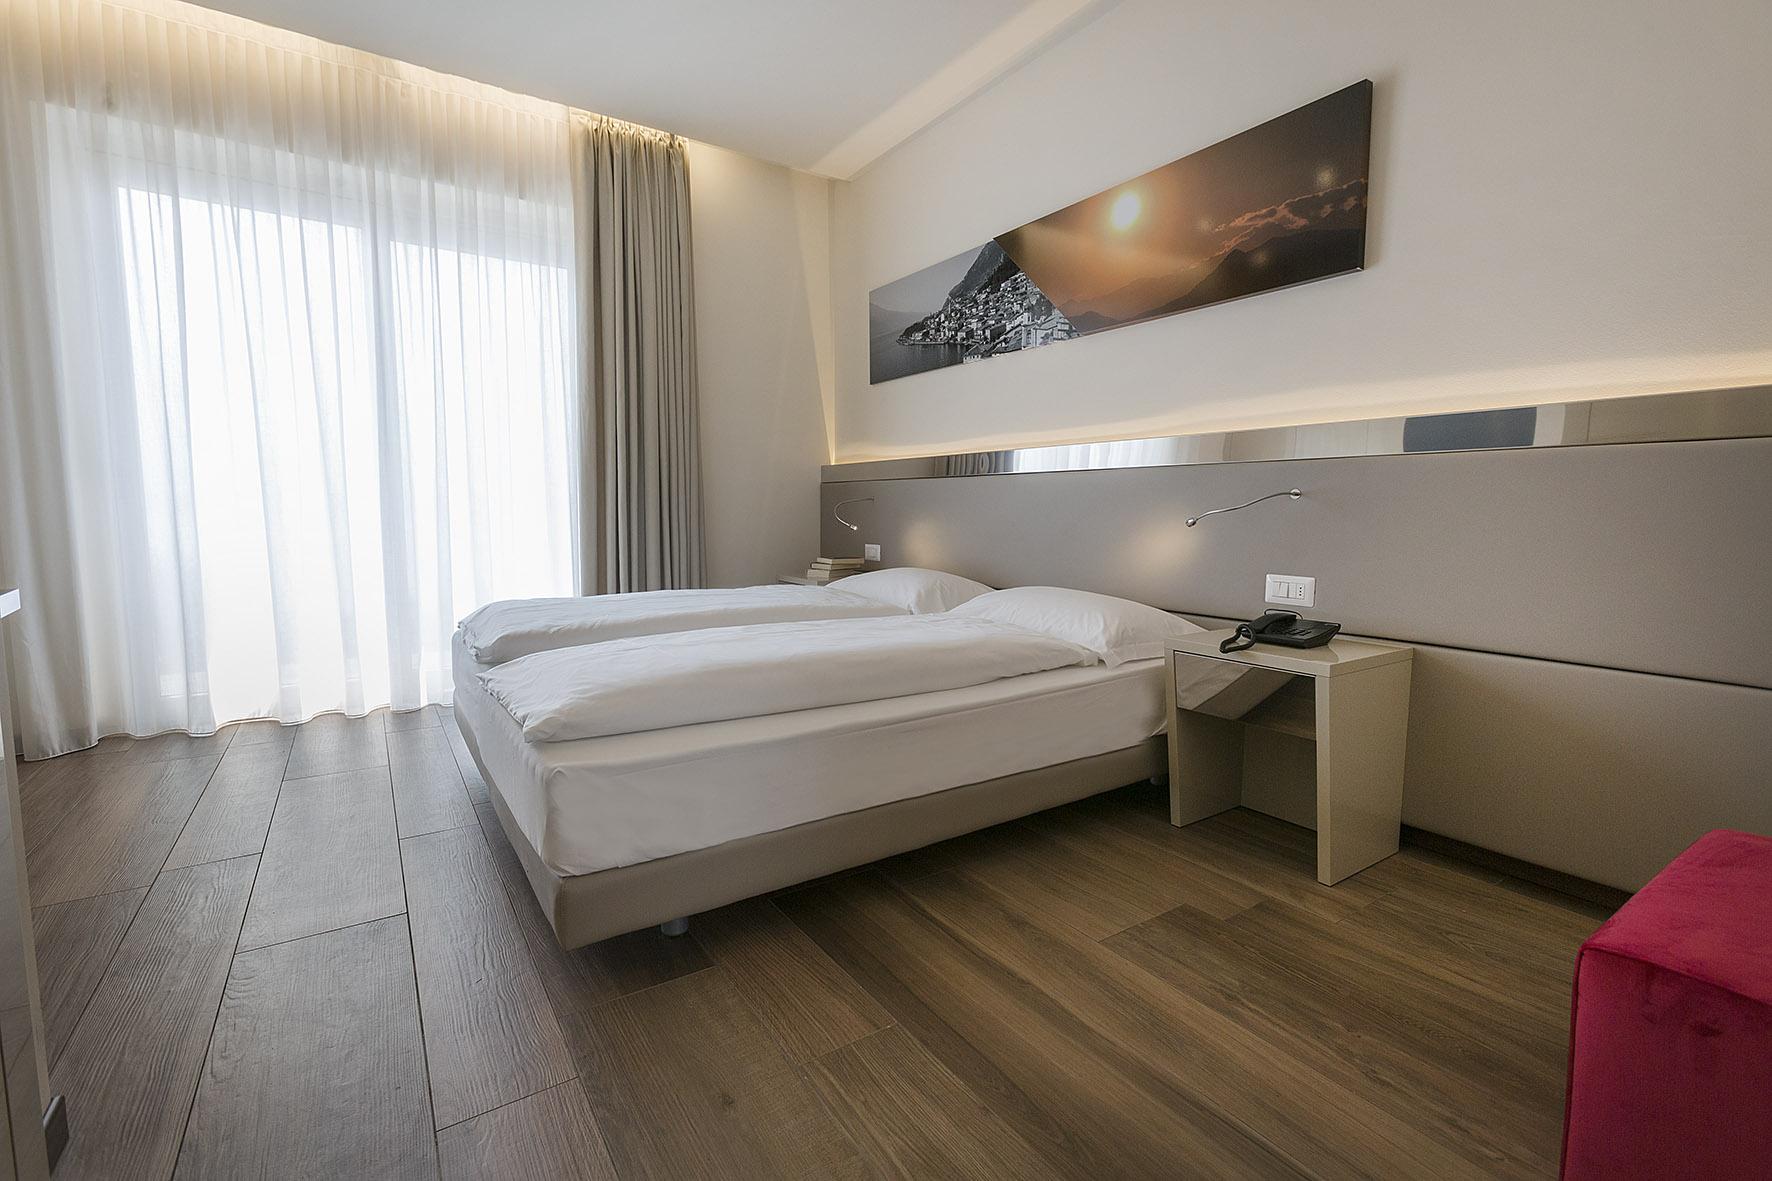 Room 411 - 001-B.jpg